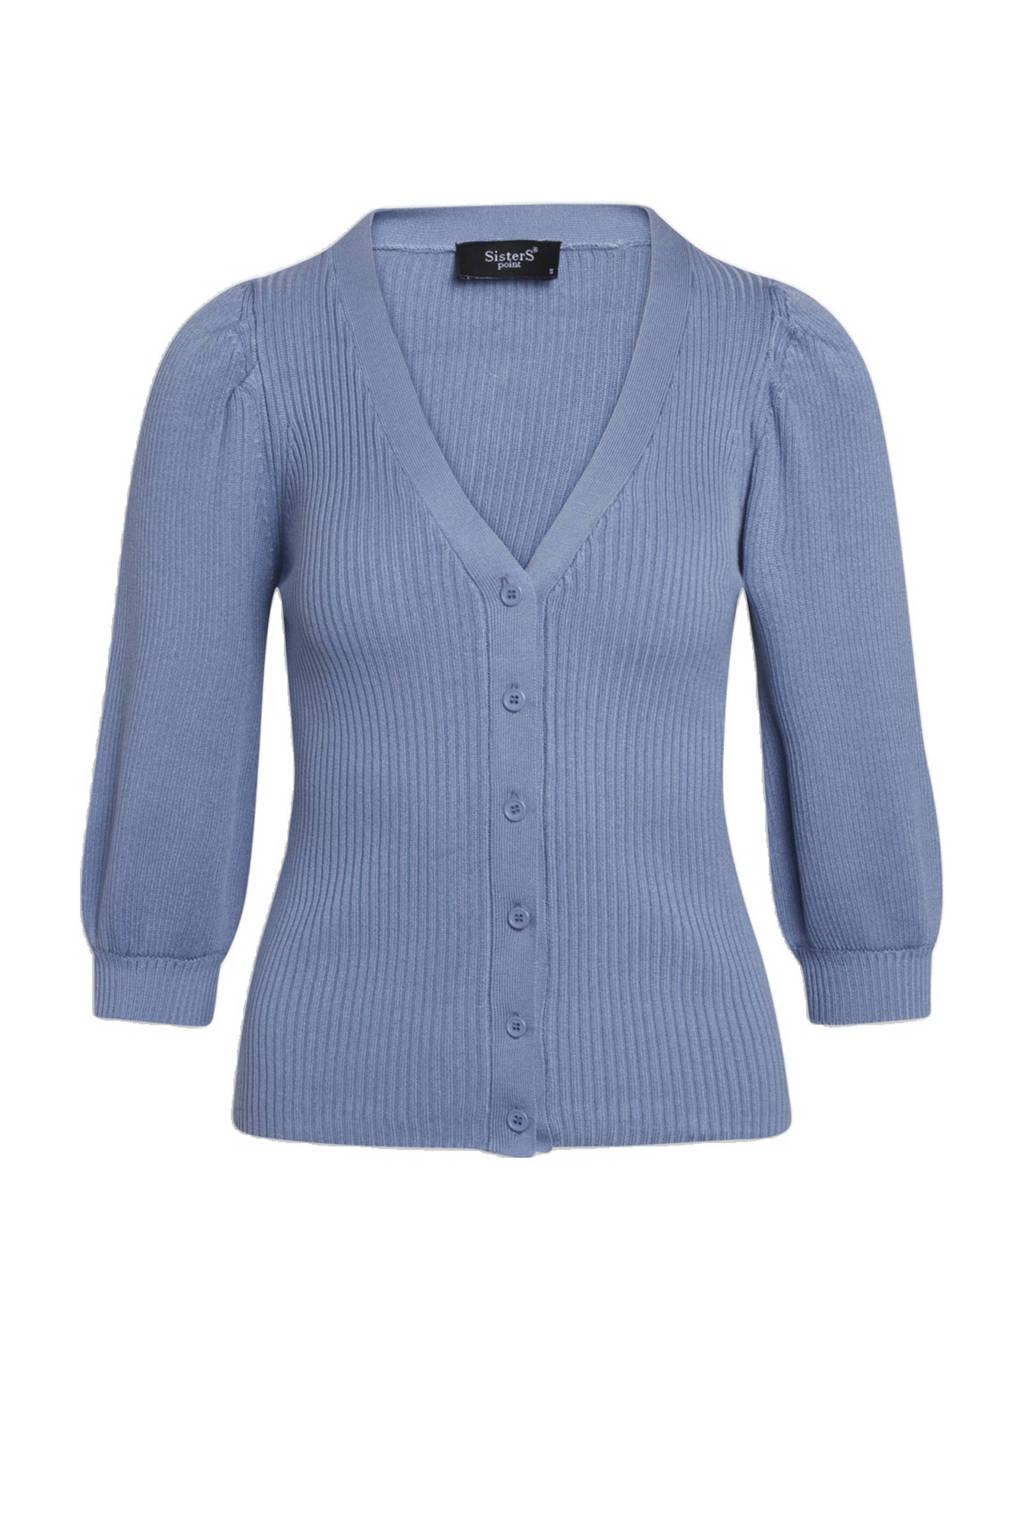 SisterS Point vest blauw, Blauw